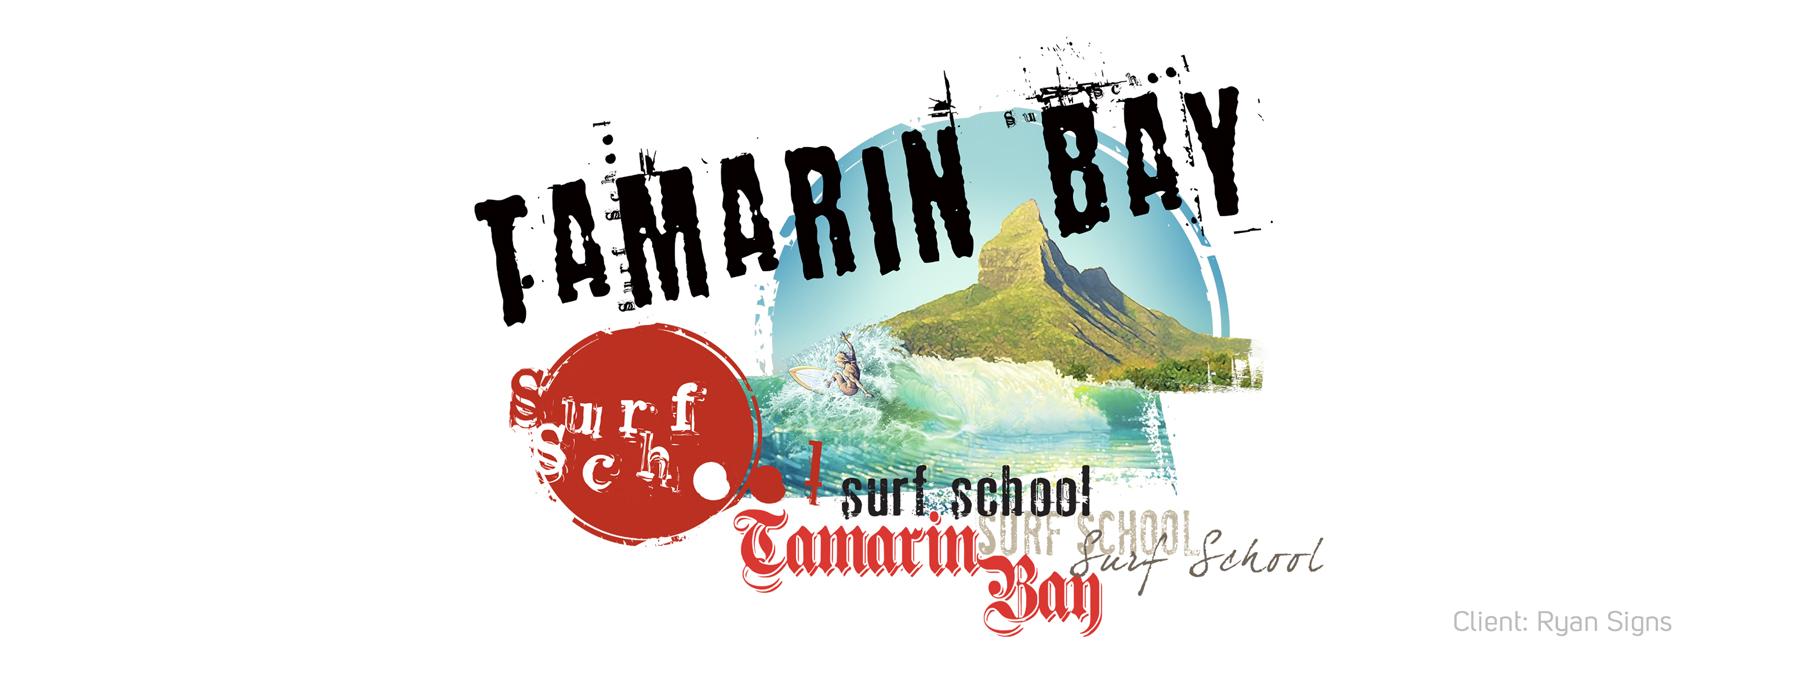 Tamarin Bay Surf School logo banner